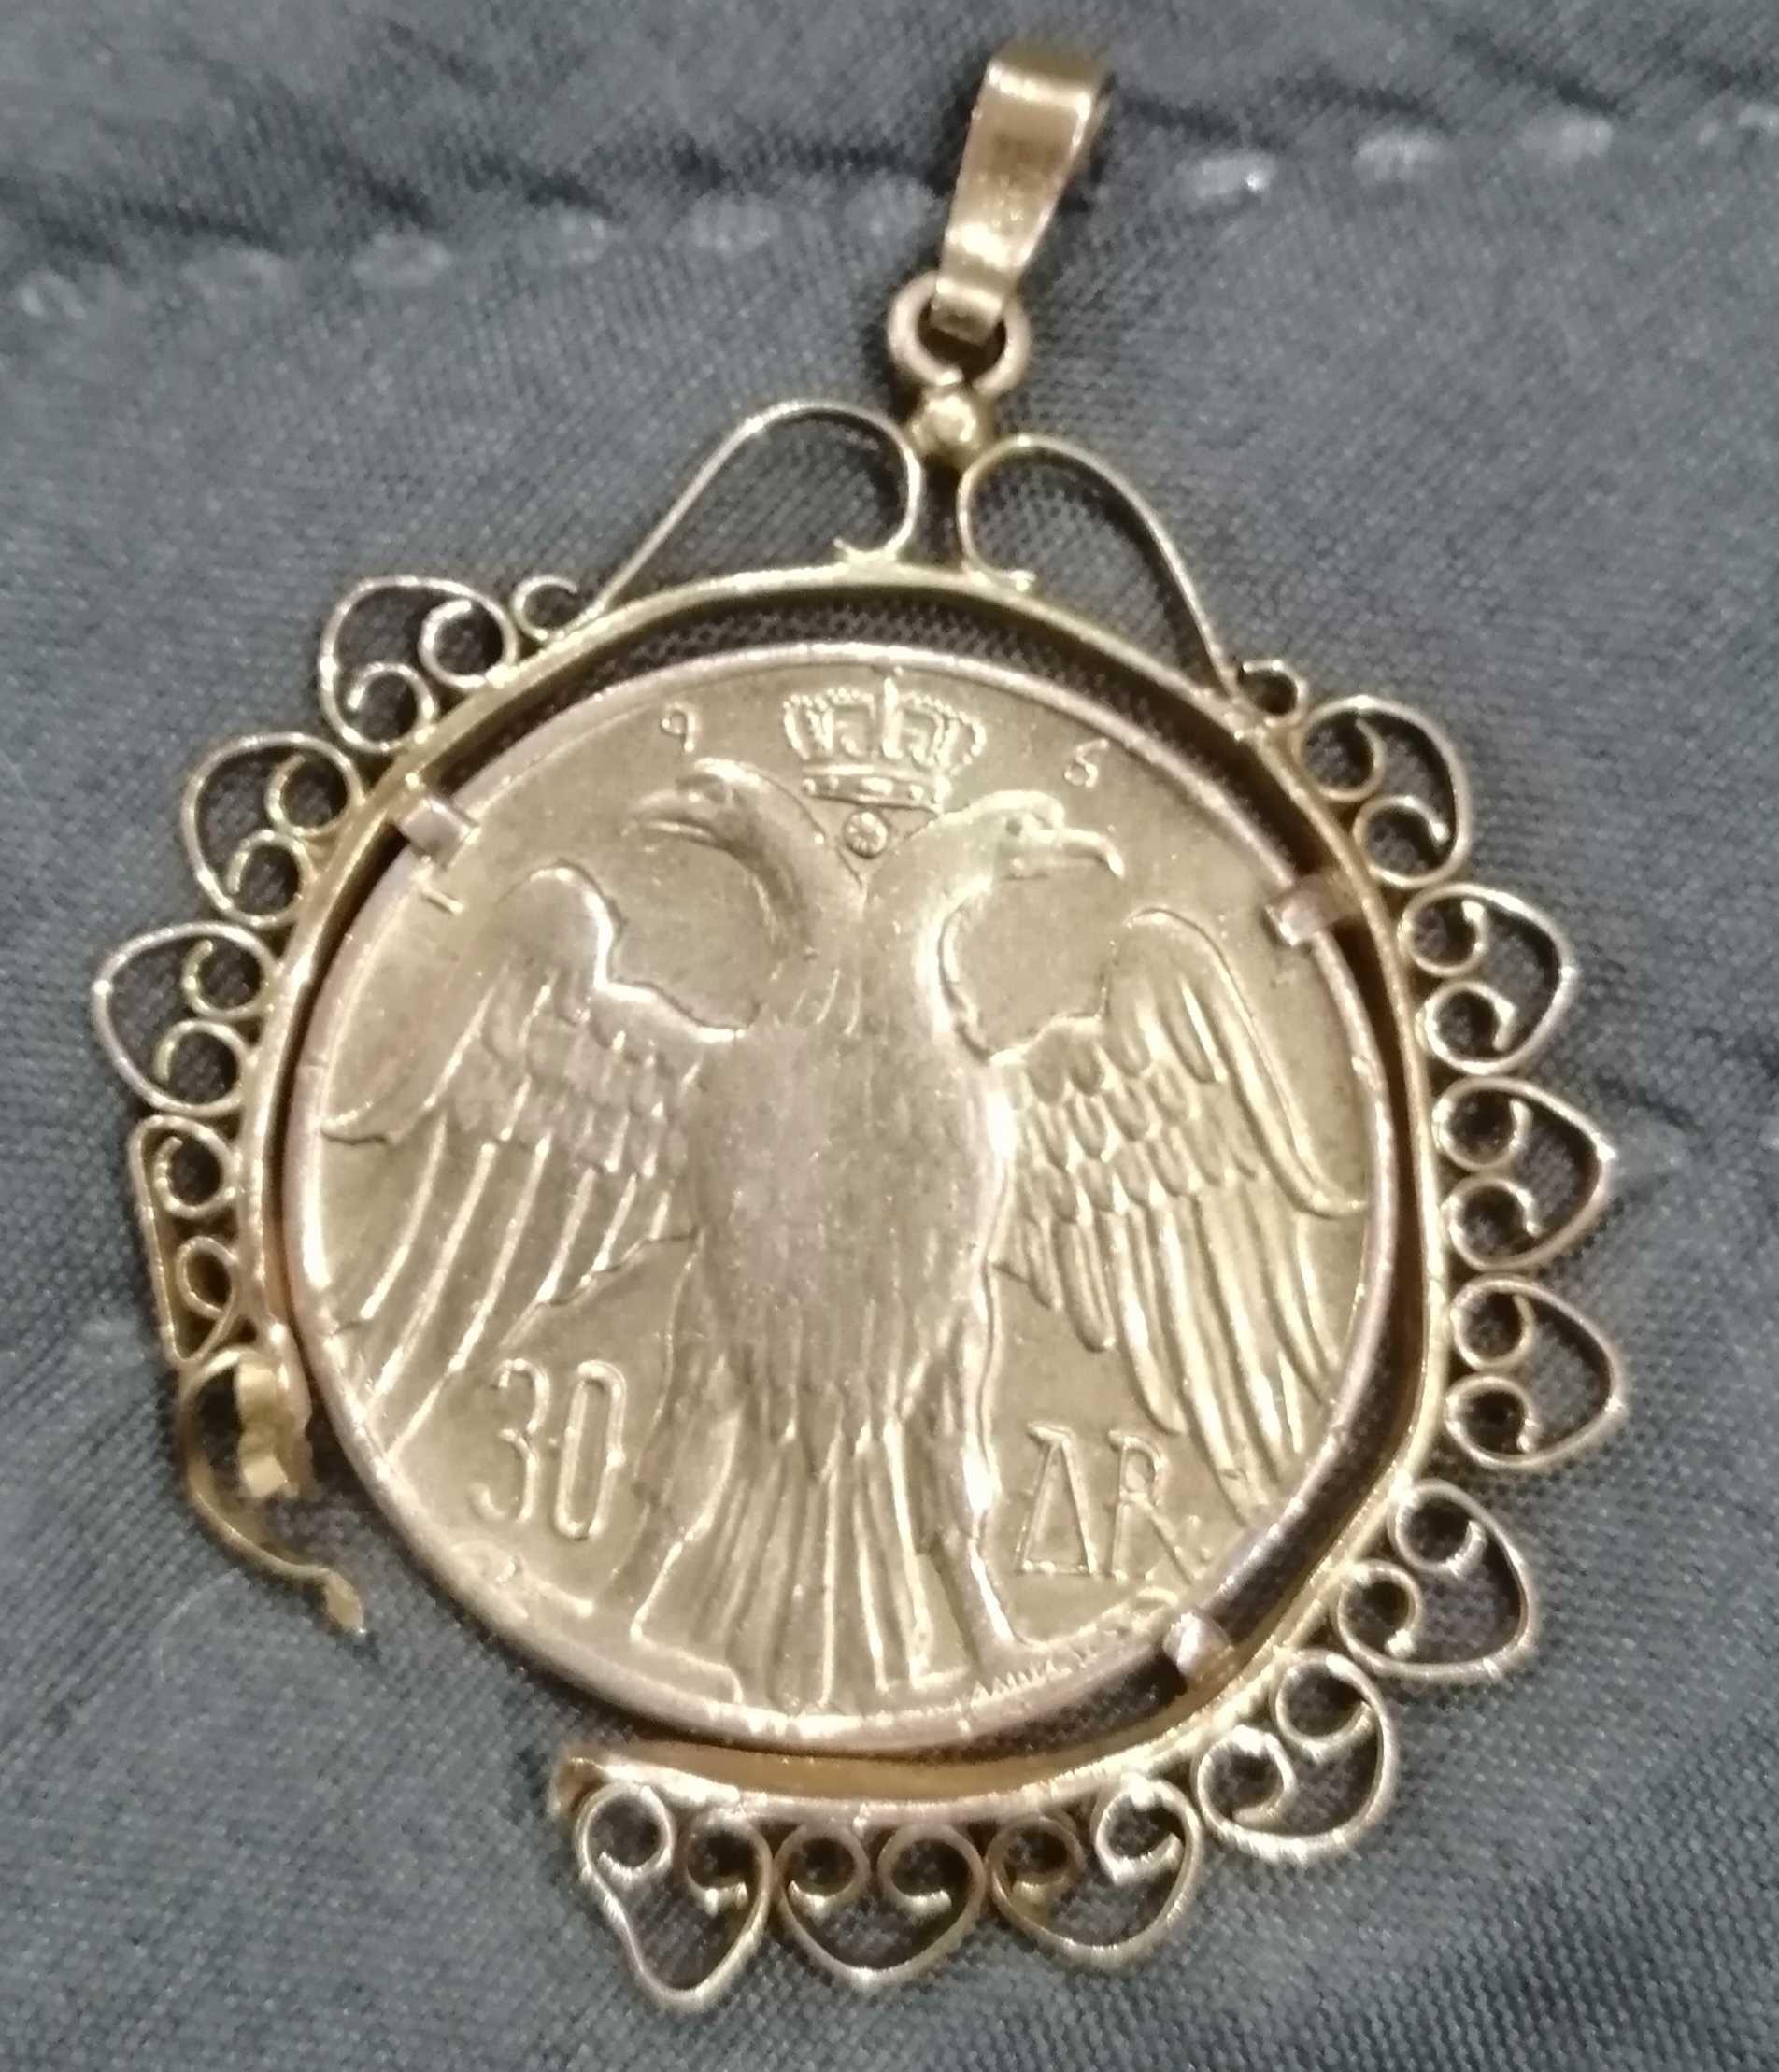 Стар сребърен позлатен медальон с монета такава 1964 год.